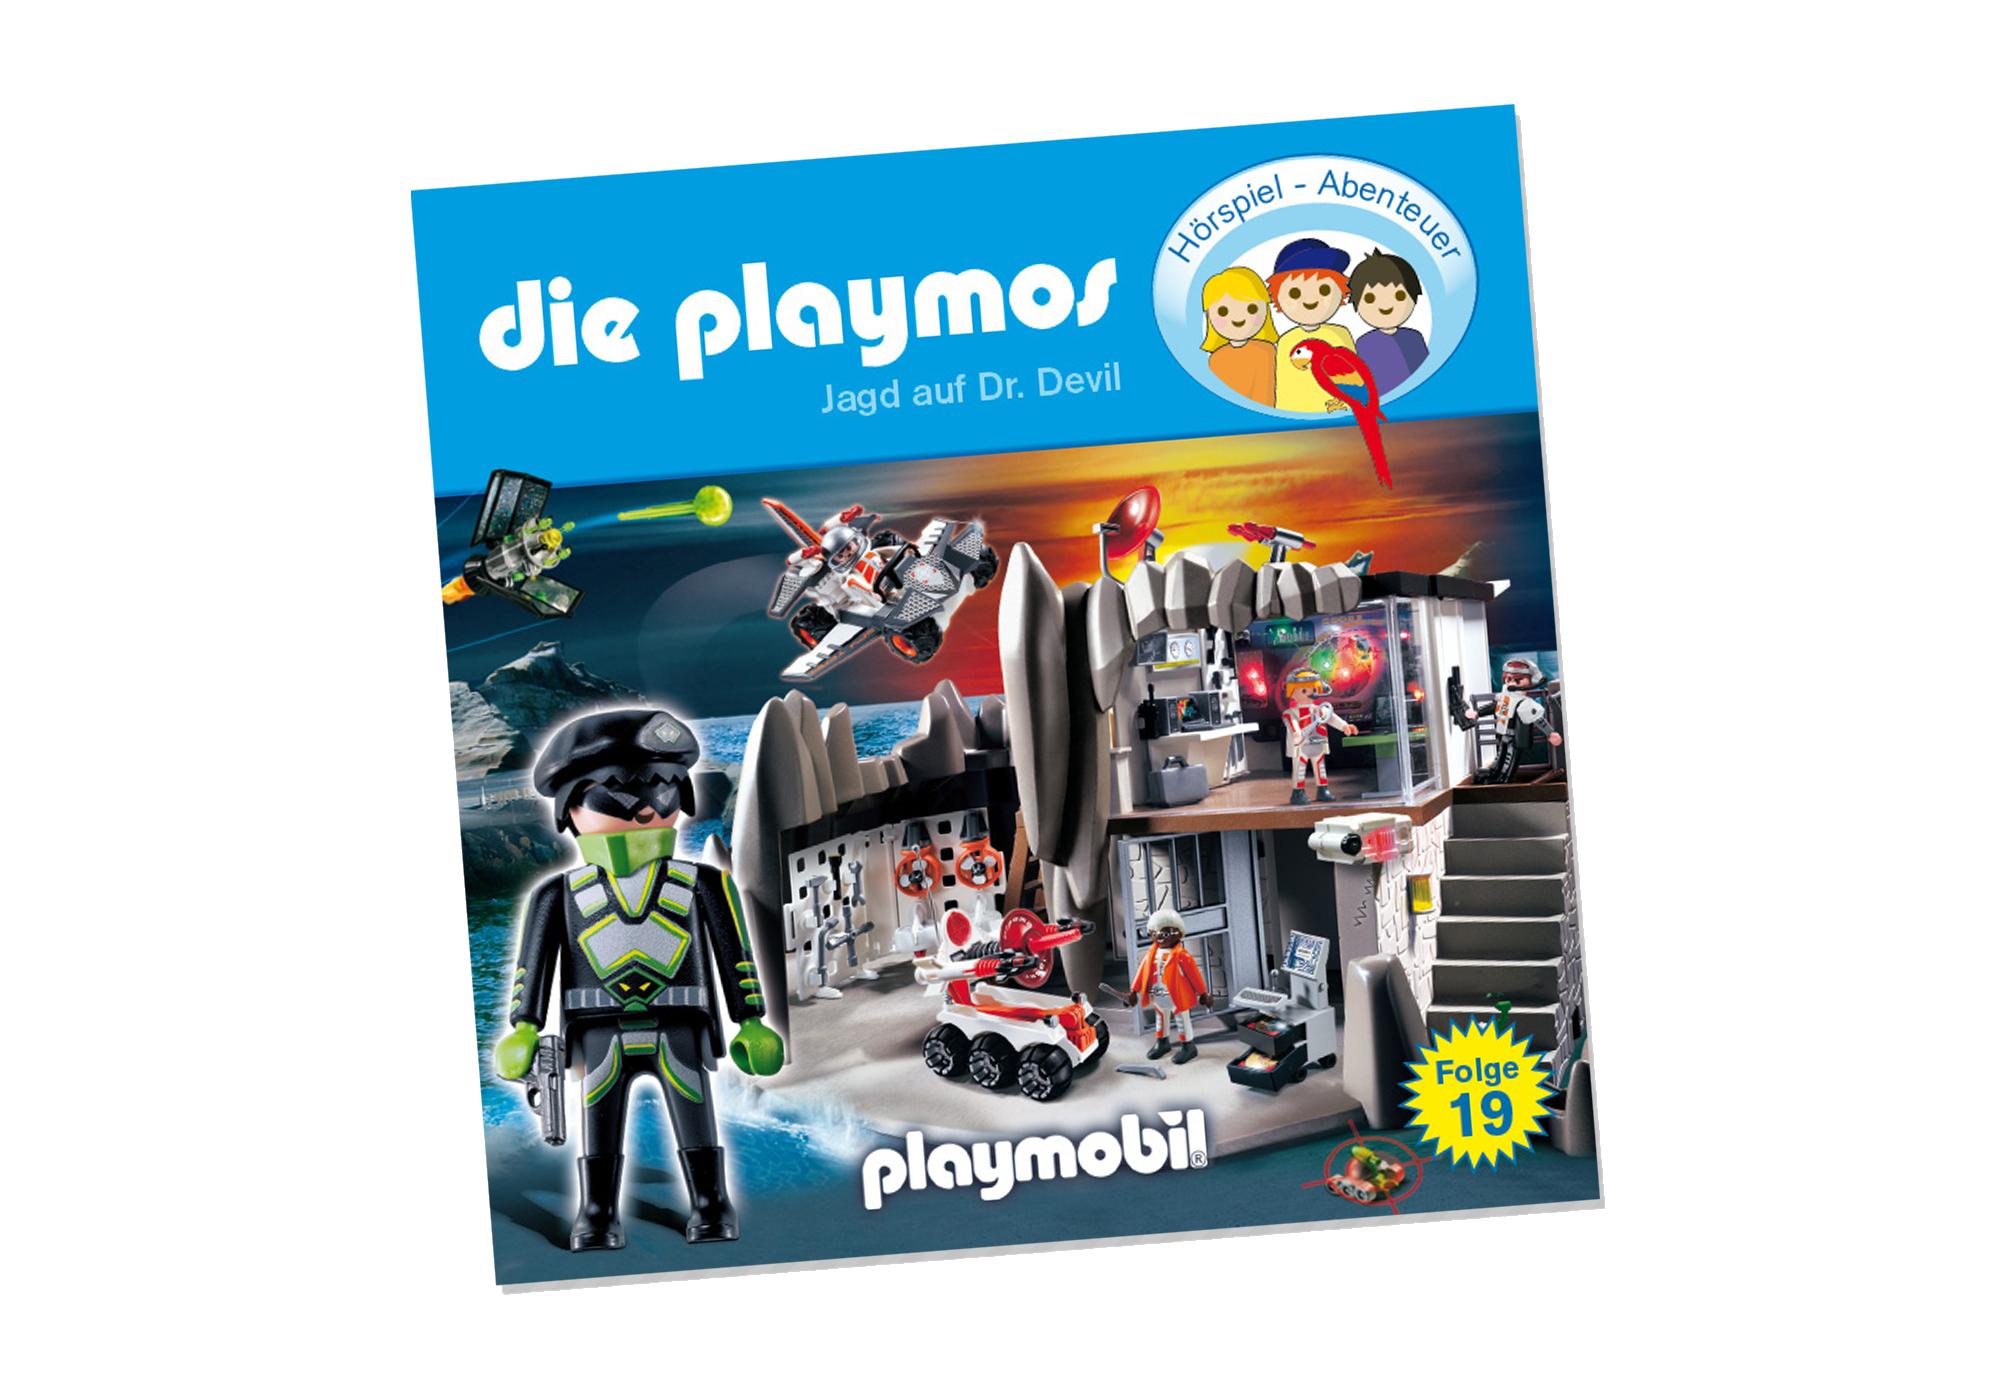 http://media.playmobil.com/i/playmobil/80272_product_detail/Jagd auf Dr. Devil (19) - CD